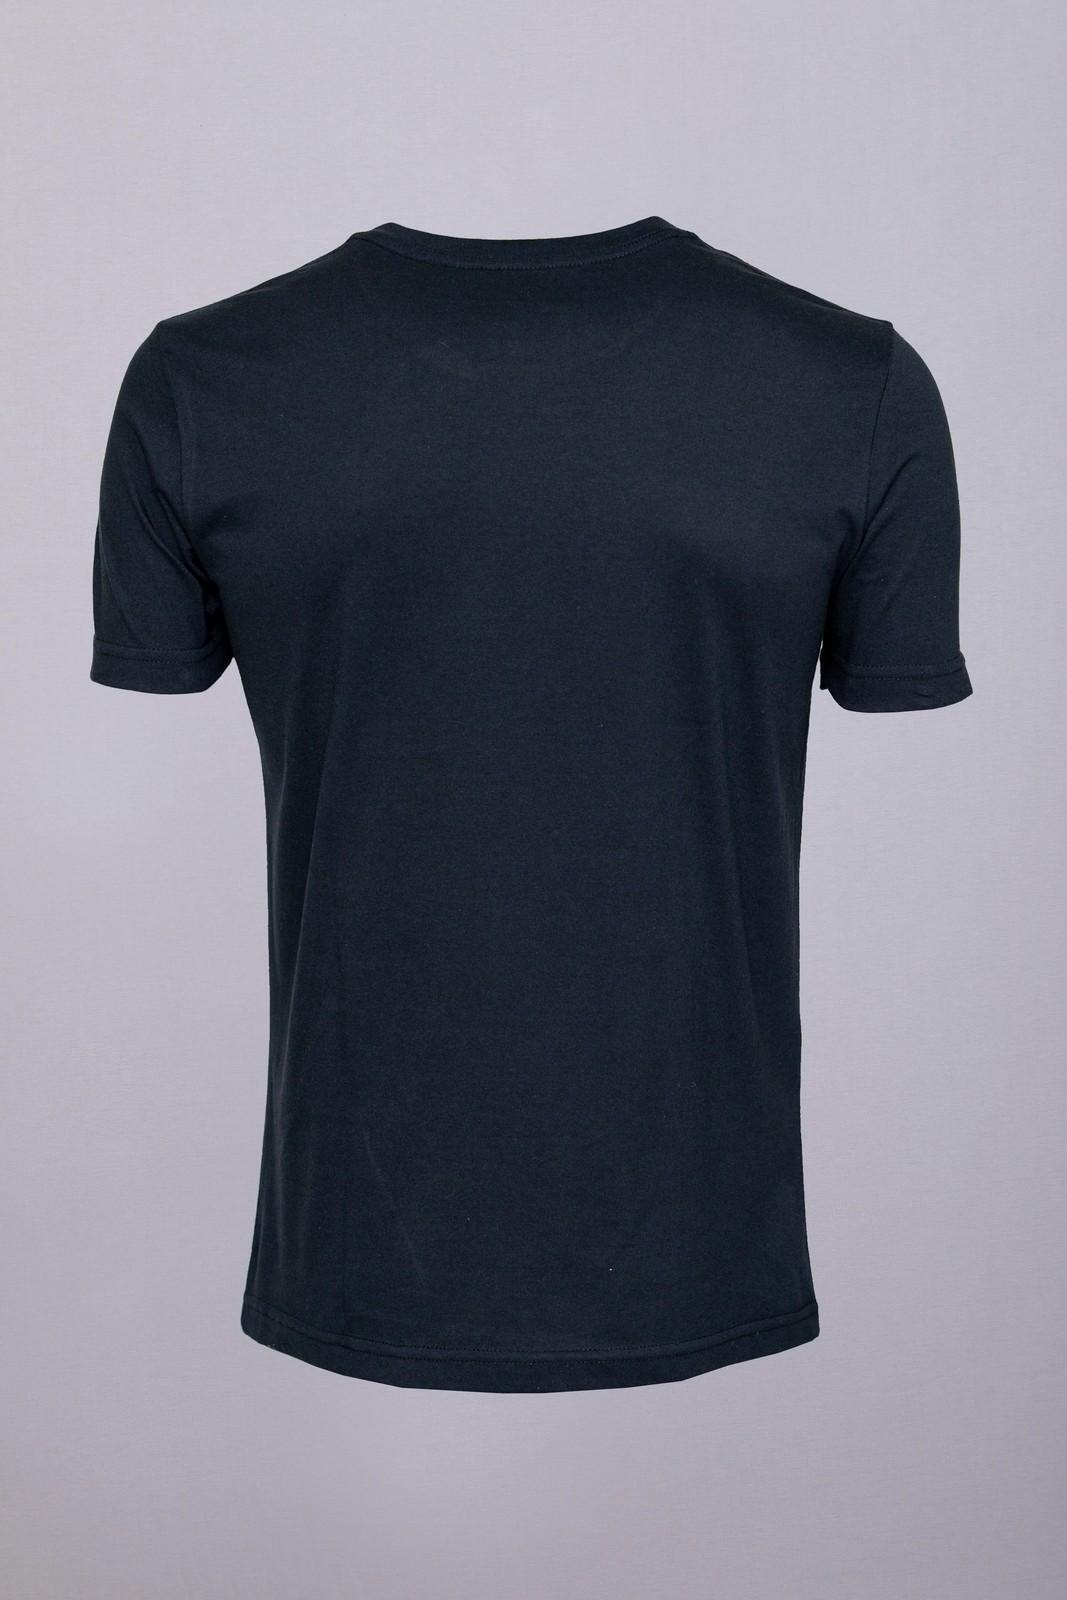 Camiseta Barrocco Mió Que Tá Tendo Preta